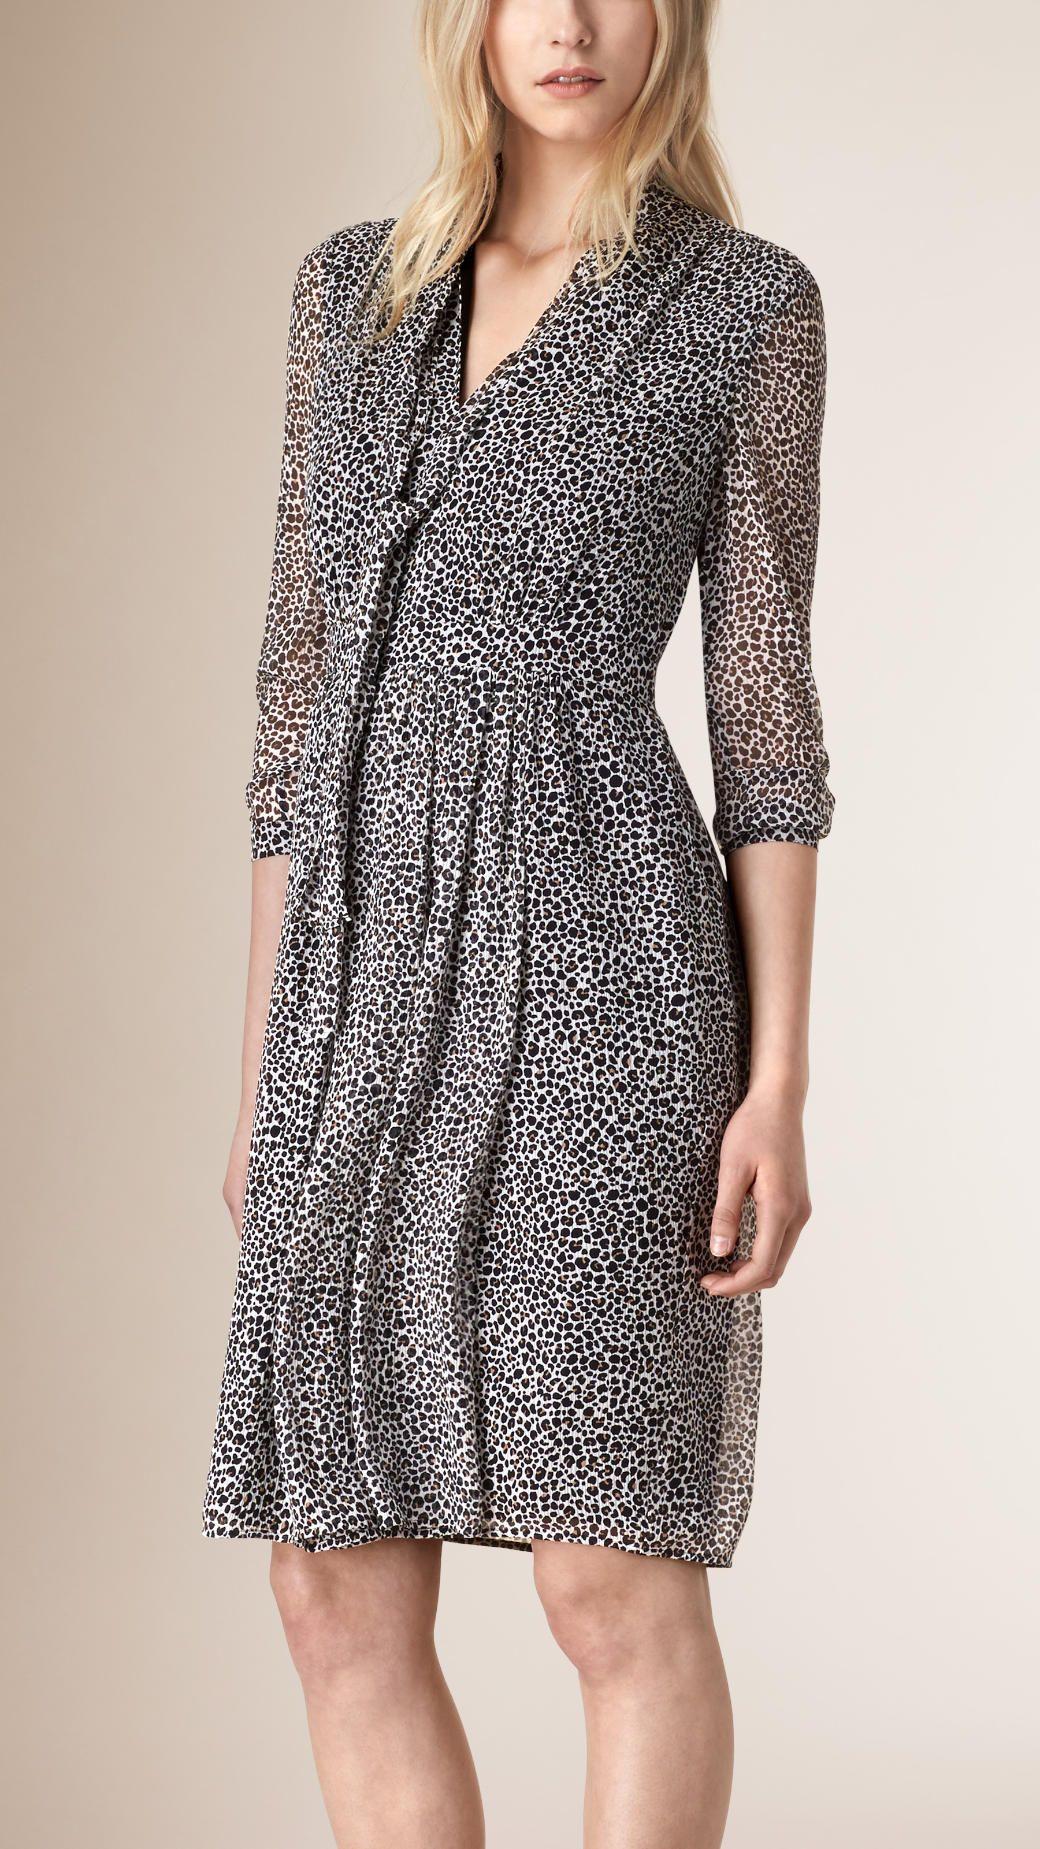 481ff99ba Vestido de crepe georgette de seda com animal print